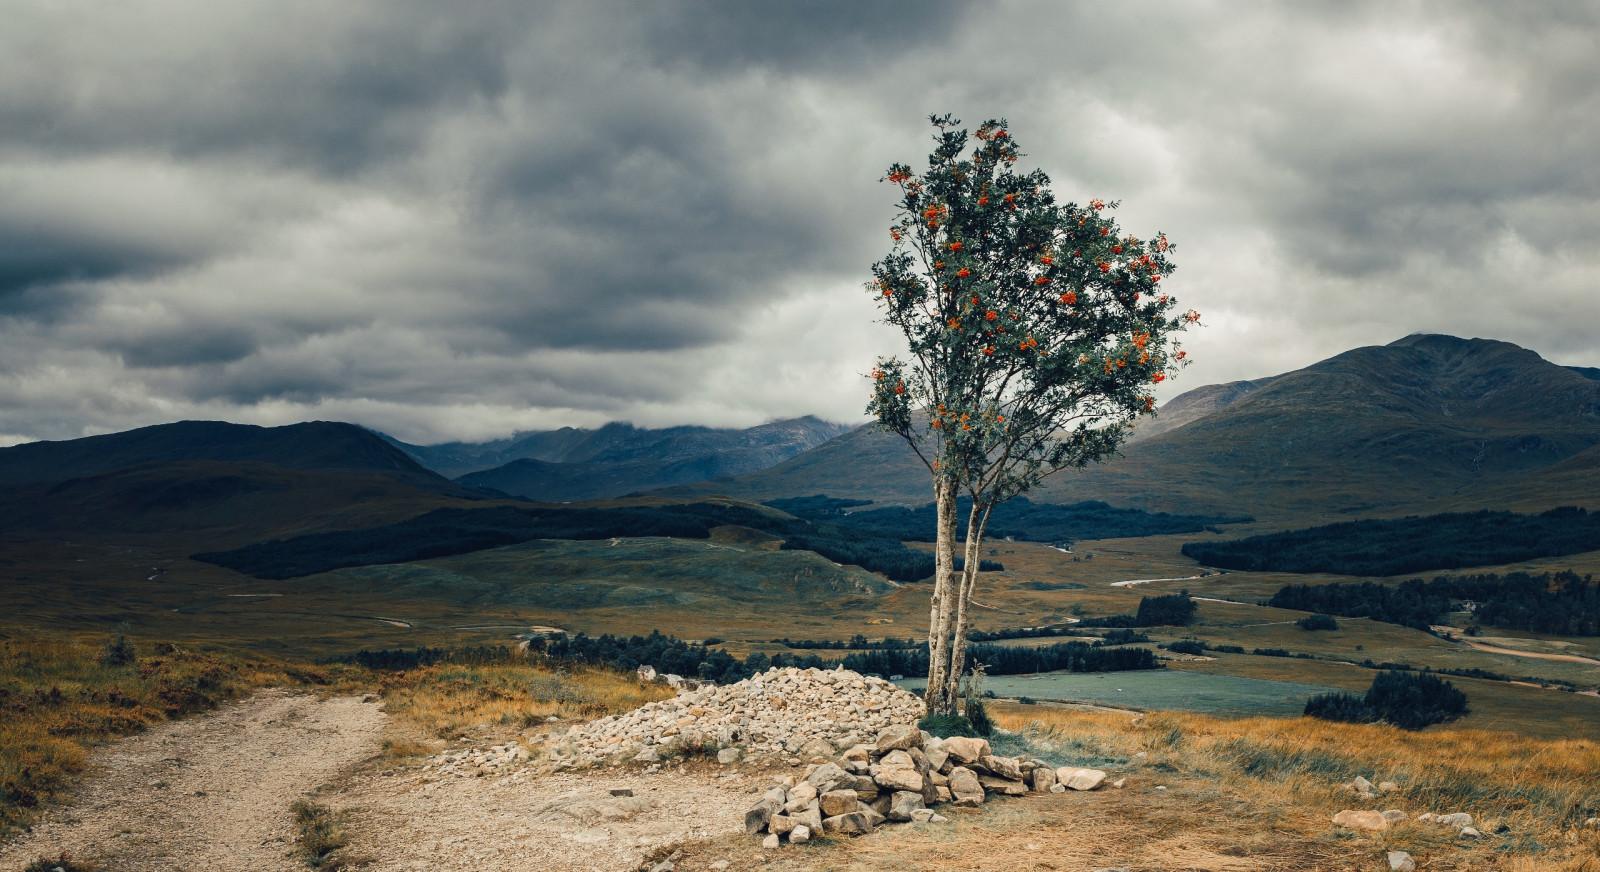 Masaüstü Doğa Gökyüzü Bulutlar Manzara Ağaçlar 2560x1396